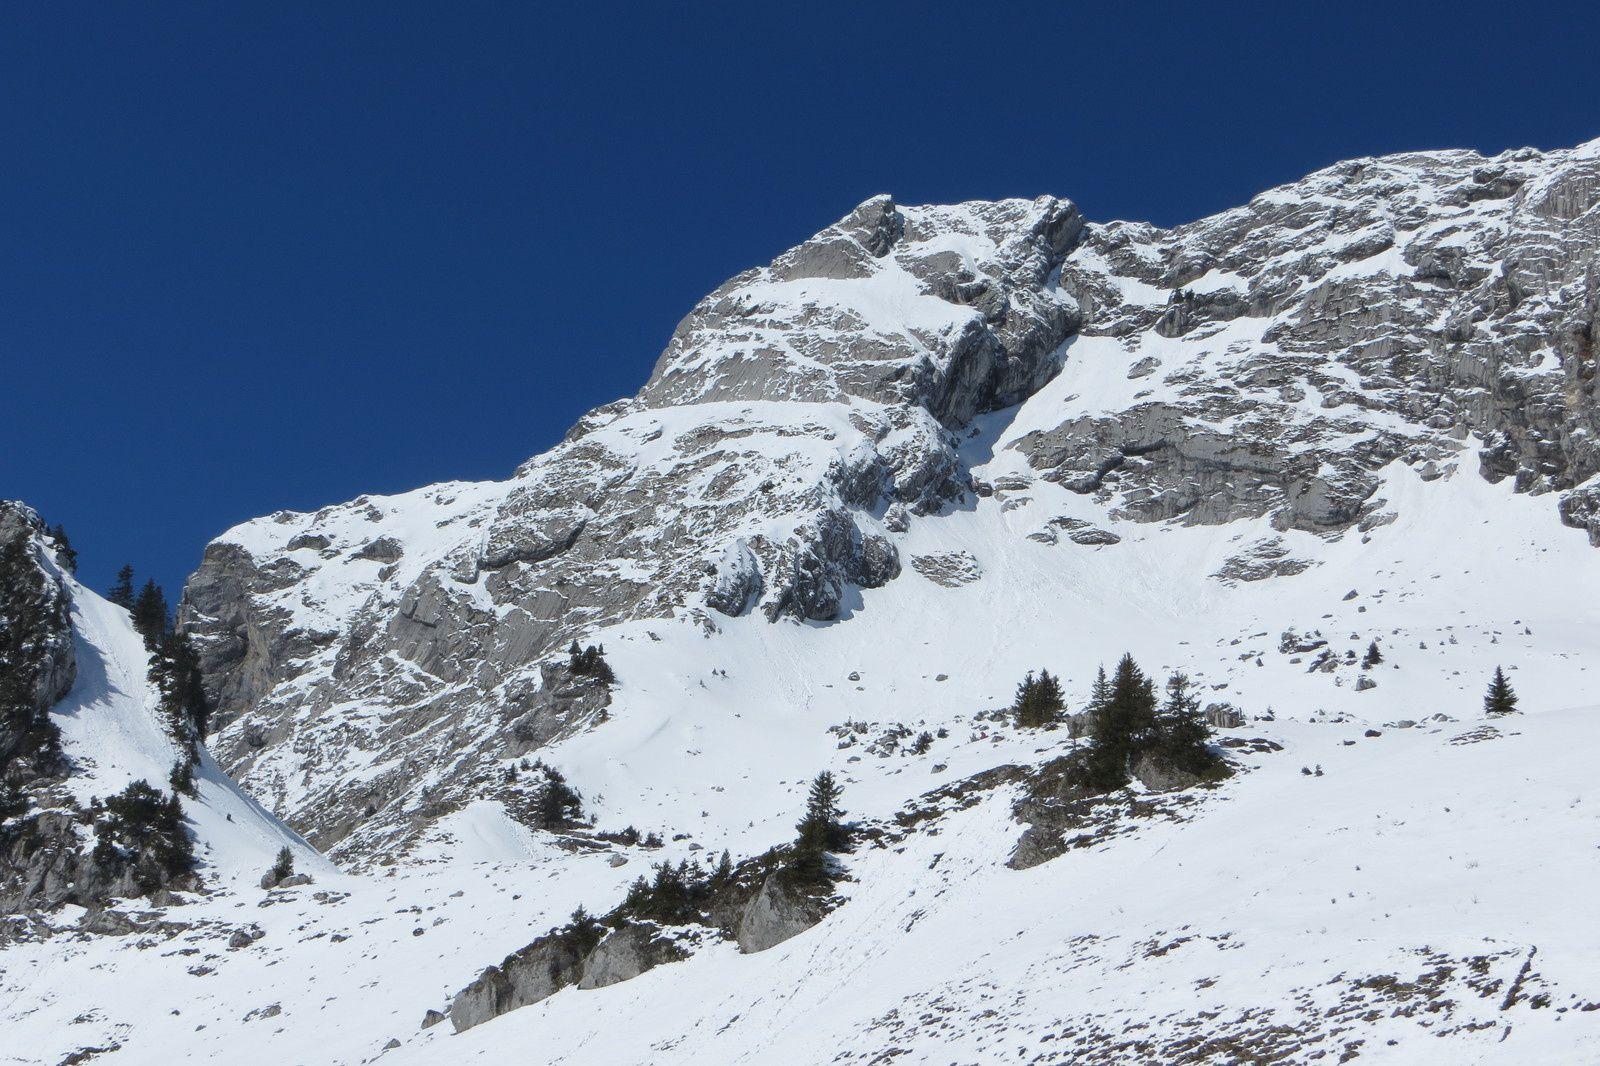 Pointe d'Arcalod 2237m